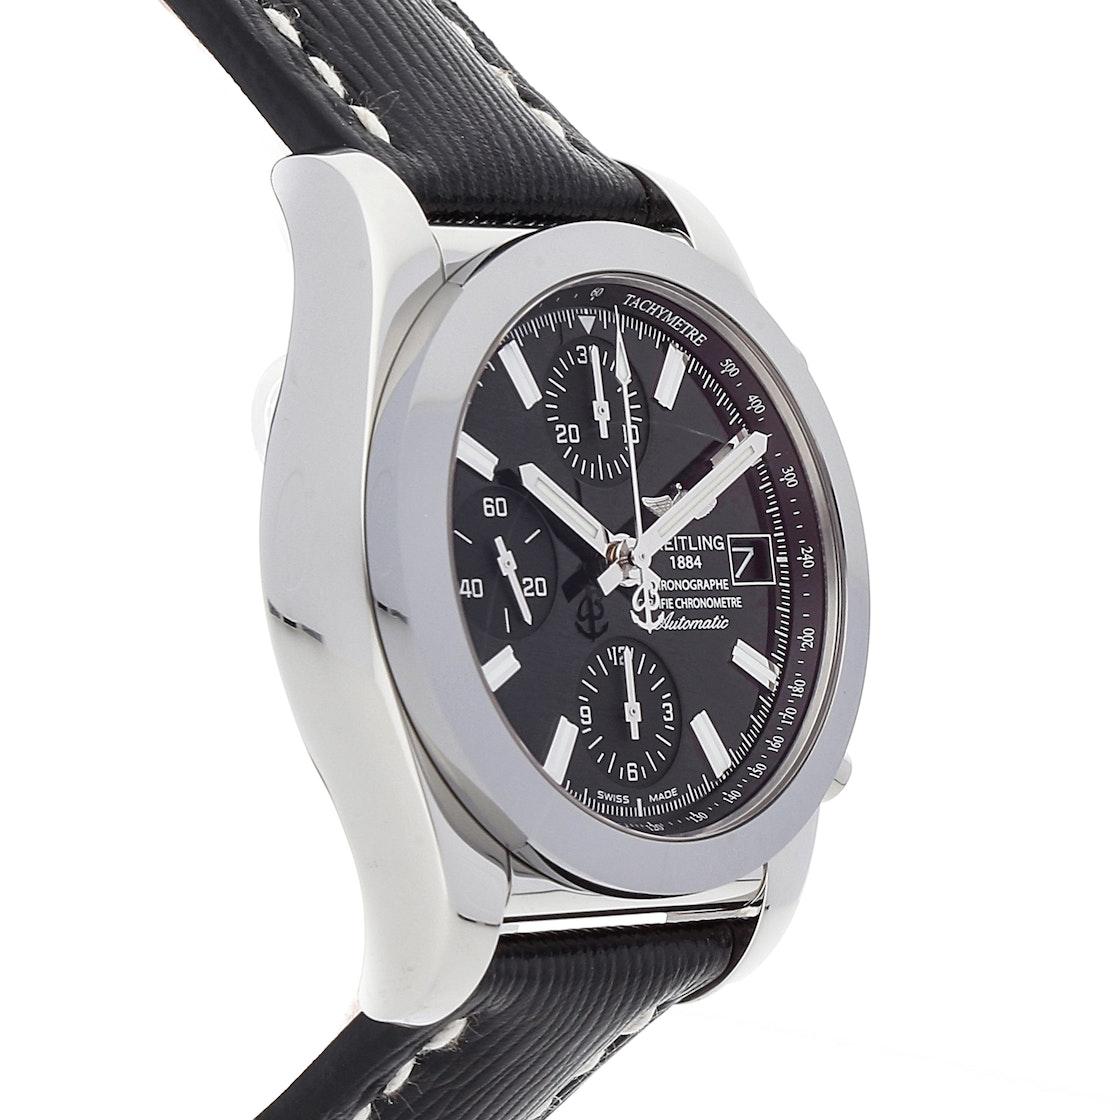 Breitling Chronomat 38 SleekT W1331012/BD92